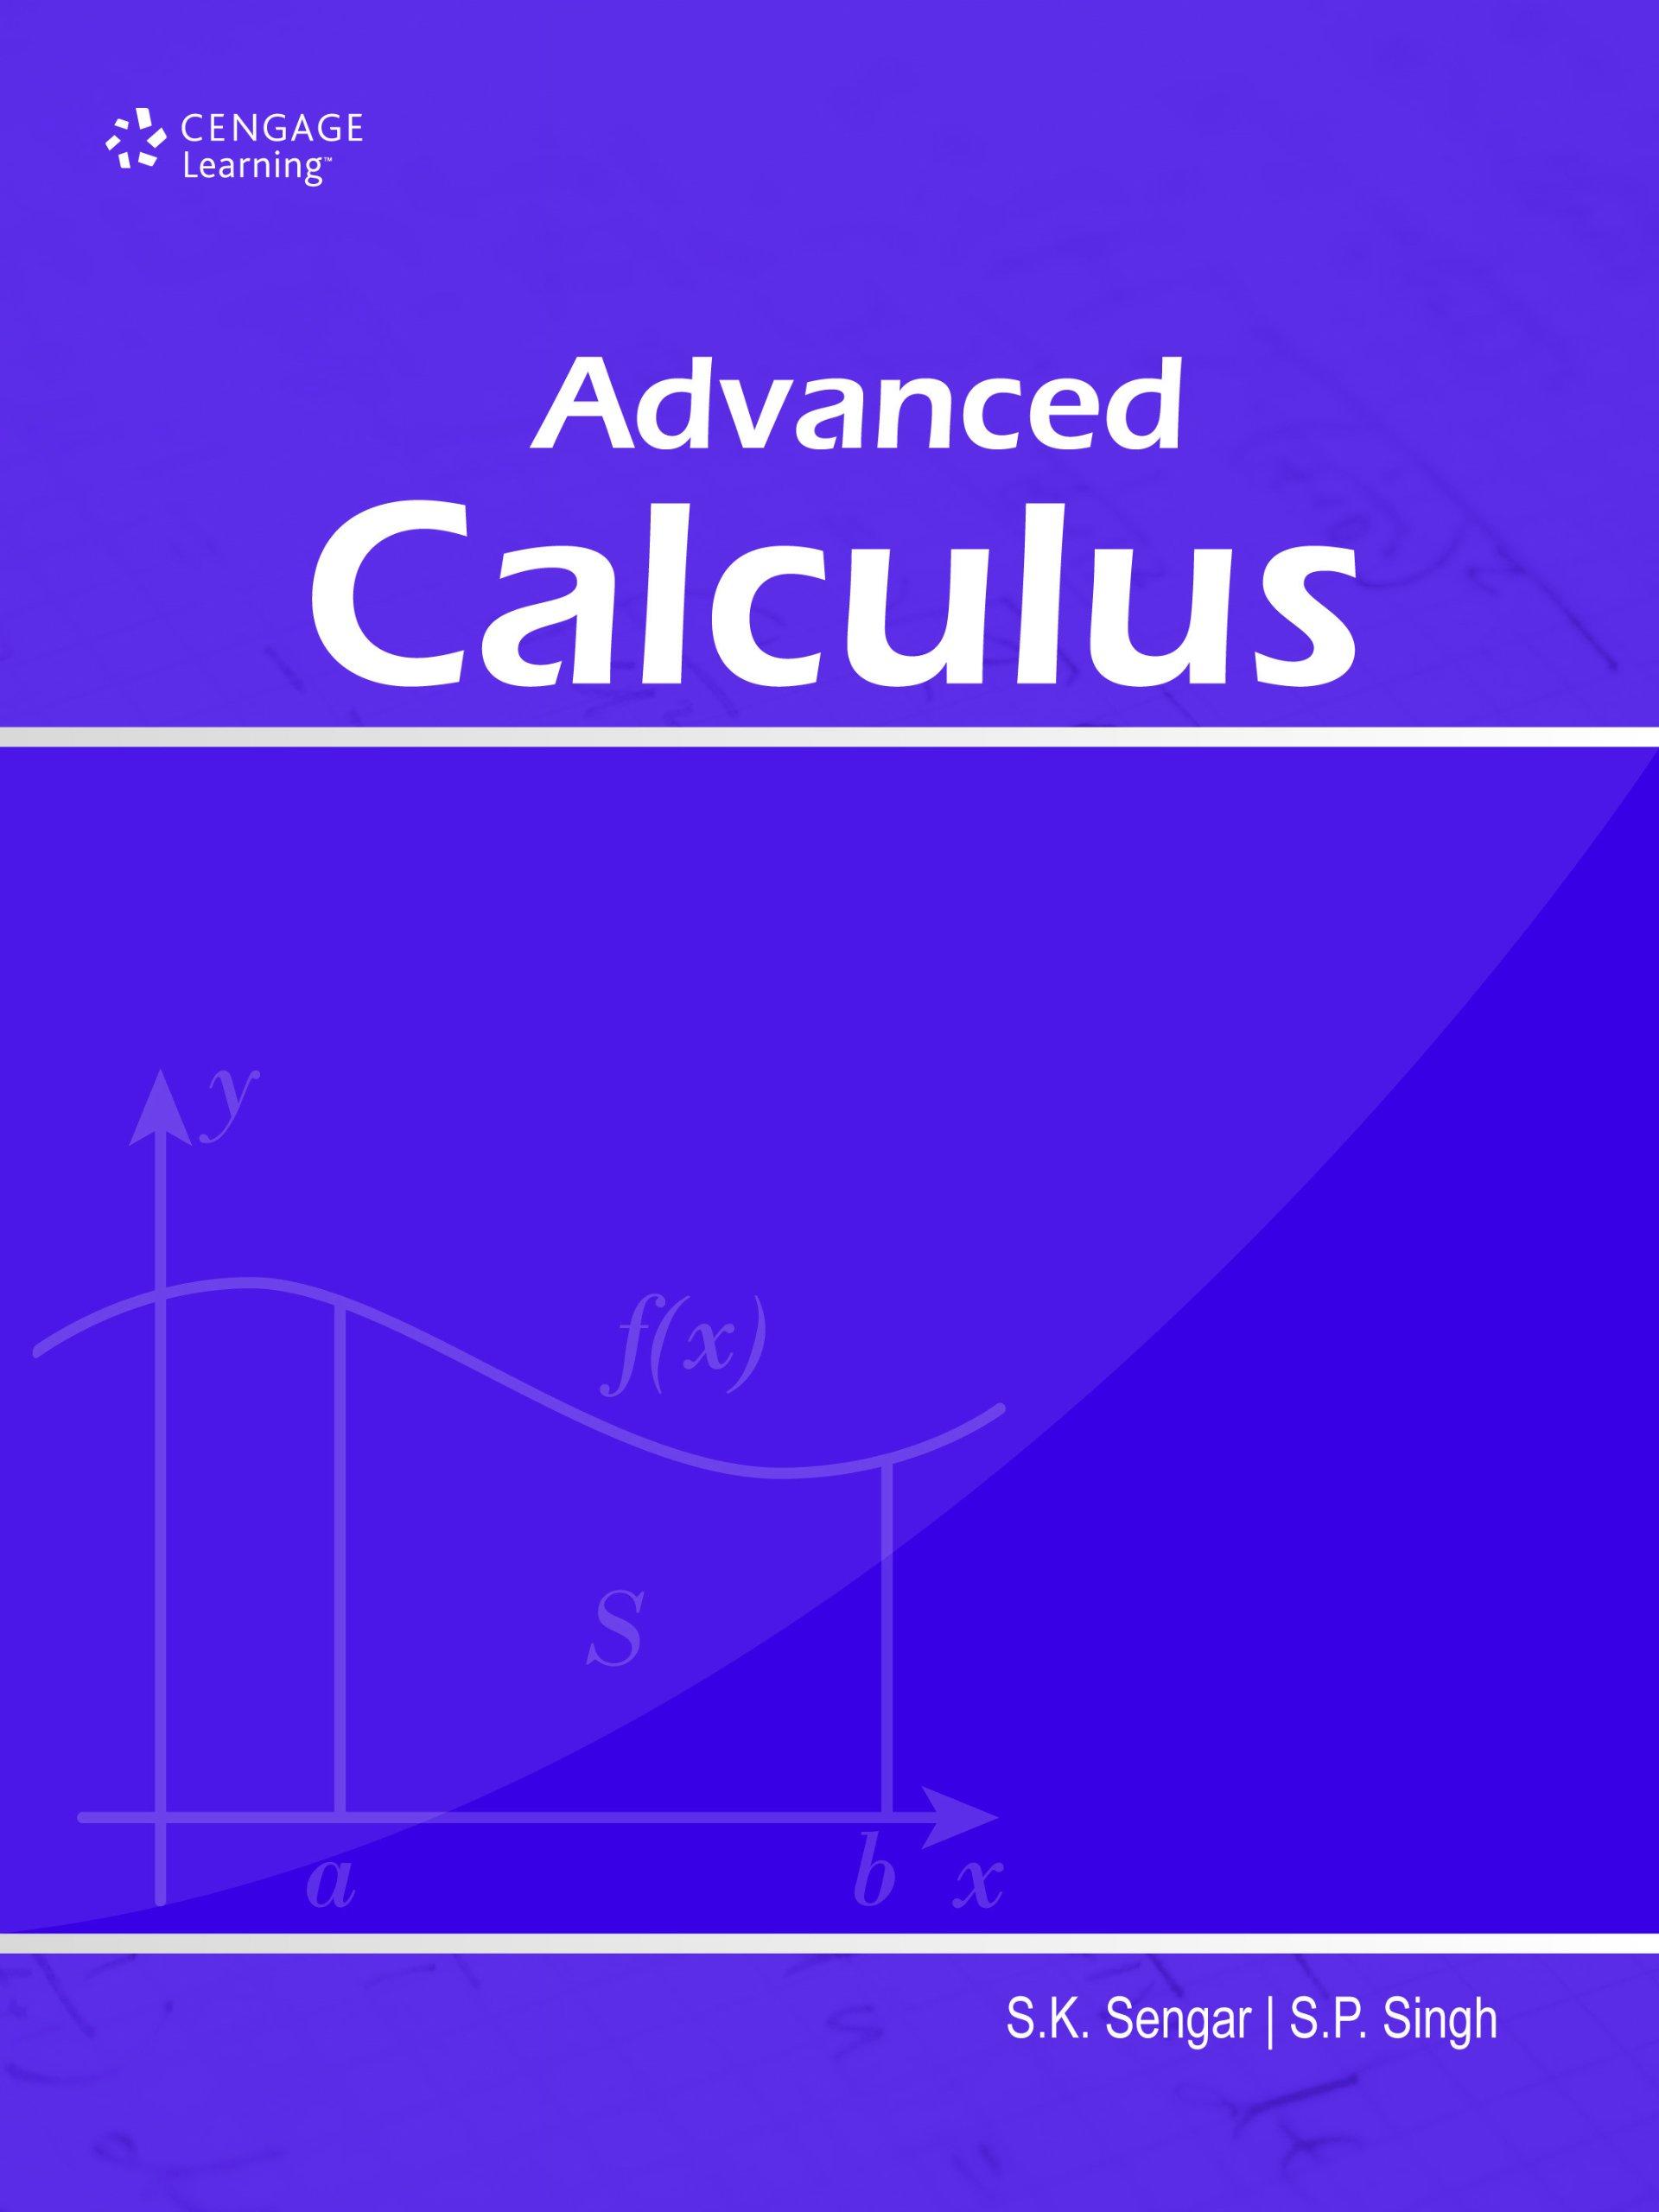 Advanced Calculus: S. K. Sengar & S. P. Singh: 9788131515402: Amazon.com:  Books